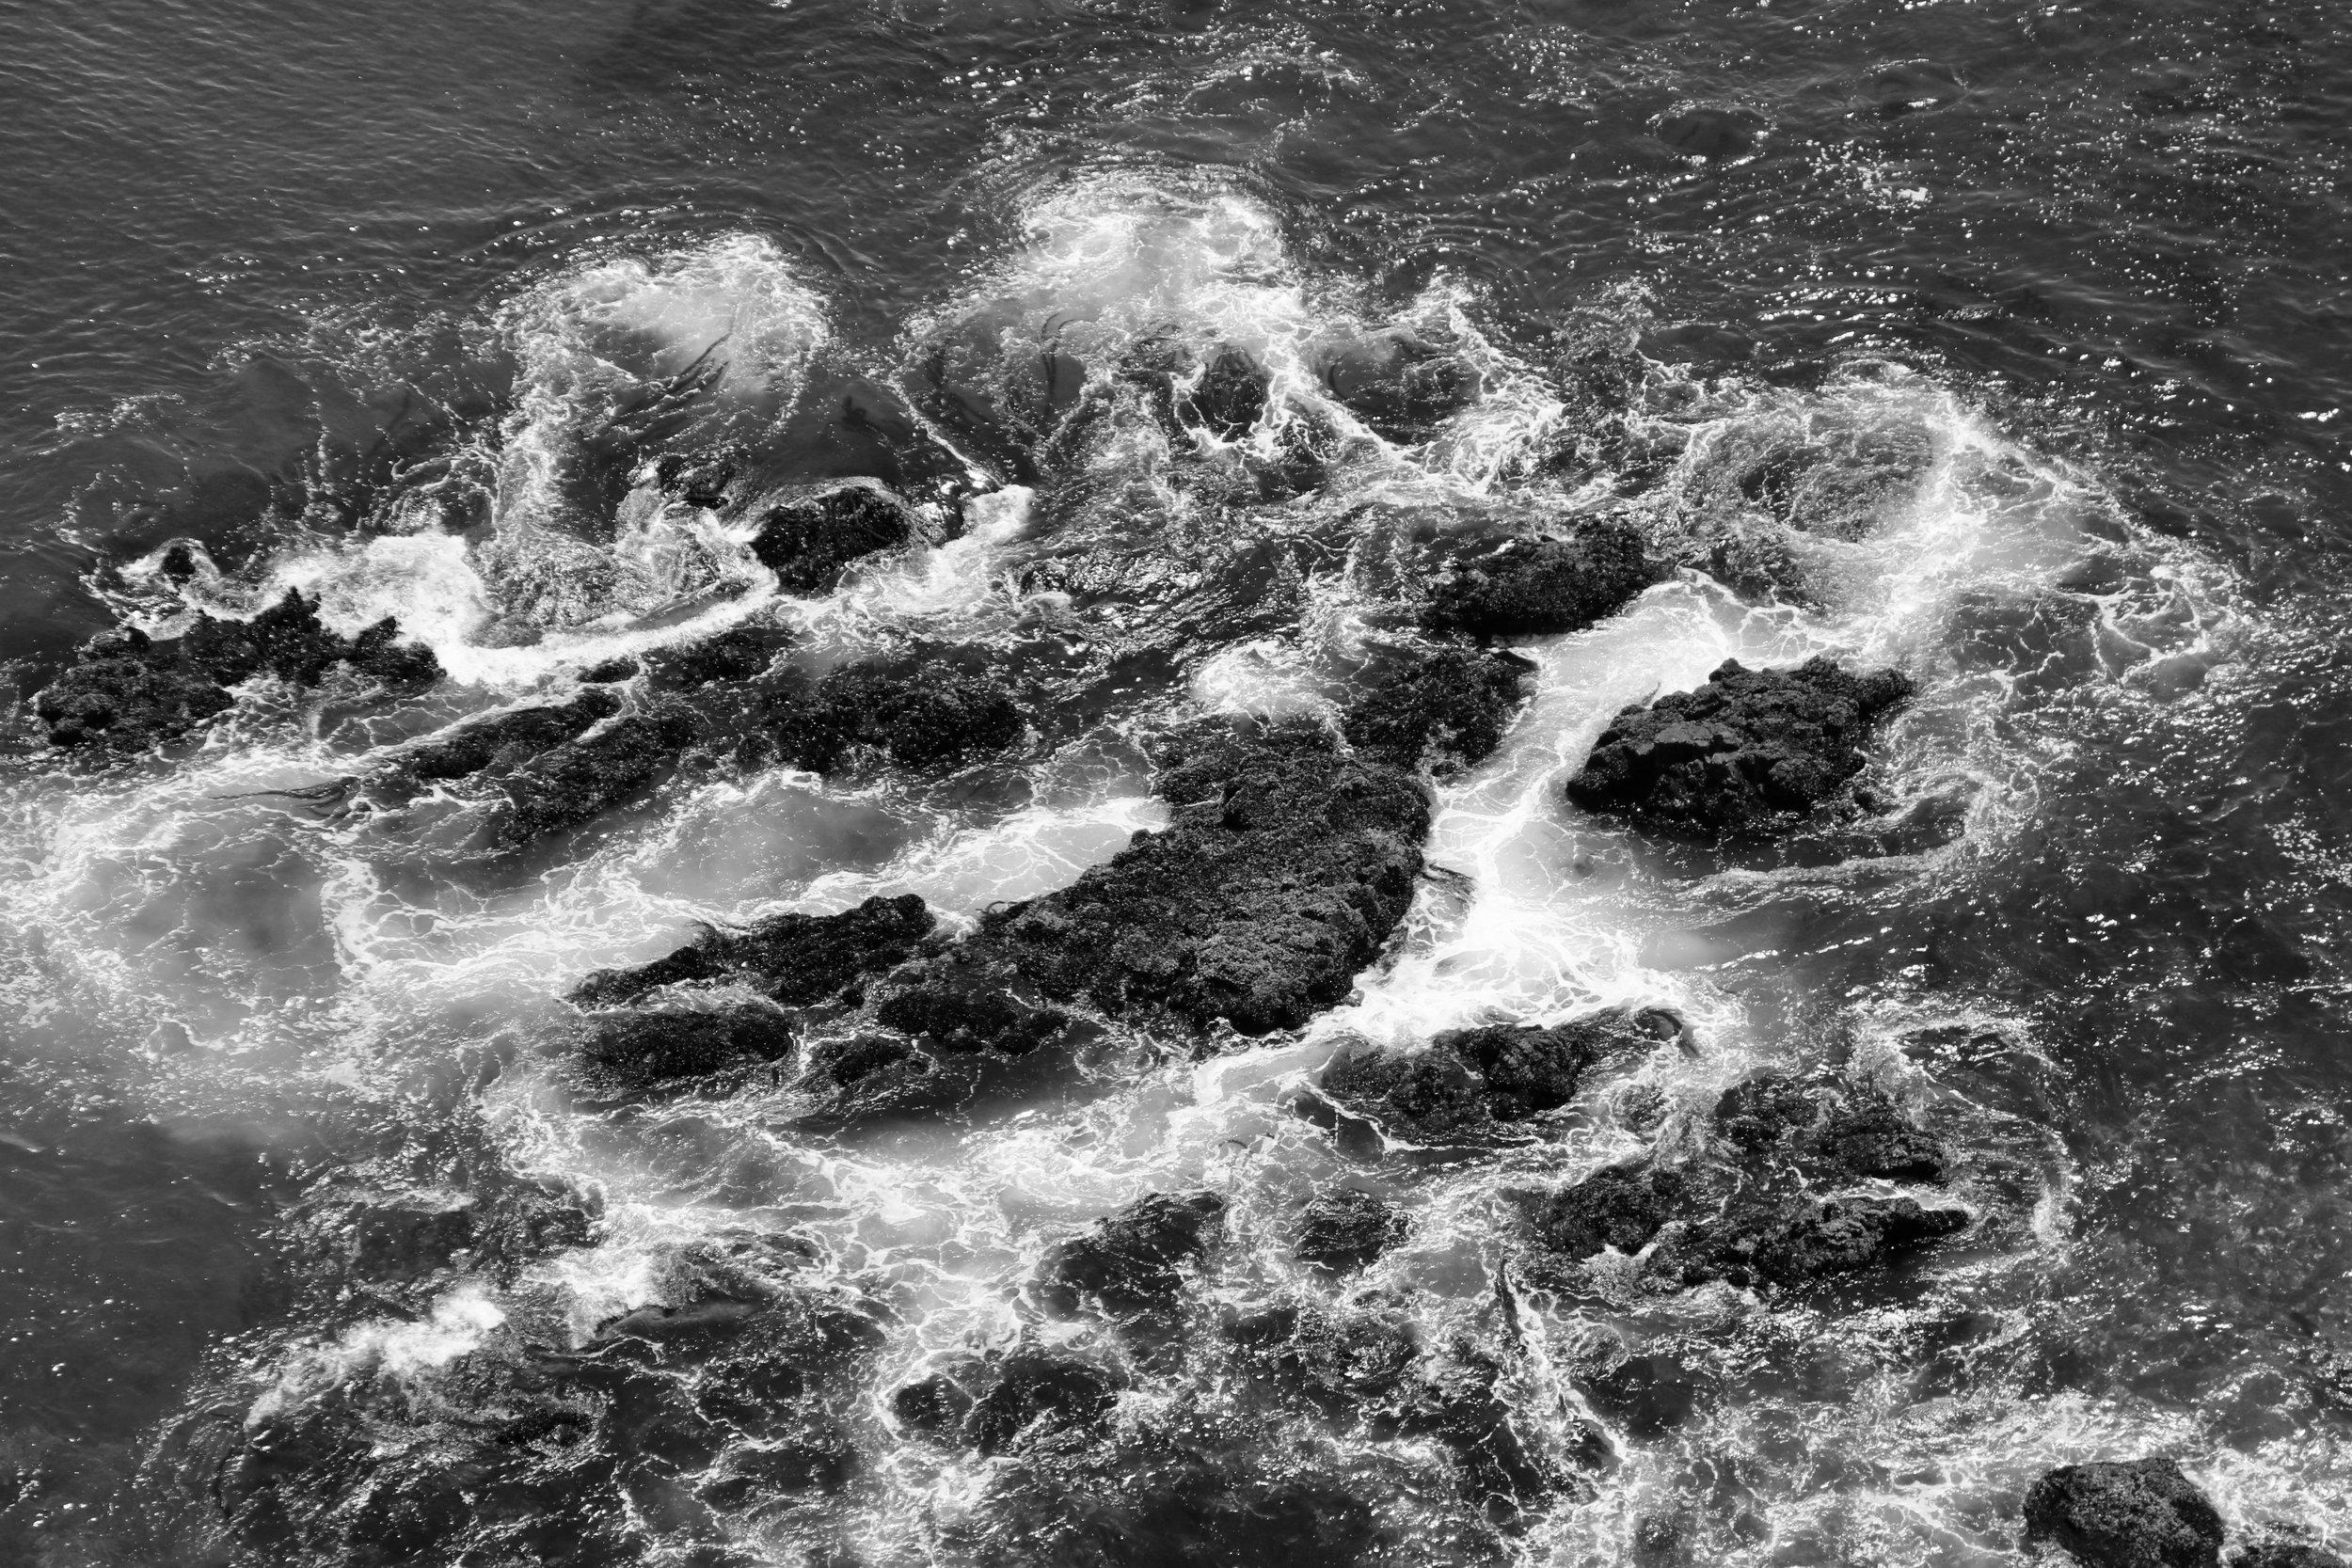 Sea Spray - Anacapa Island, Channel Islands